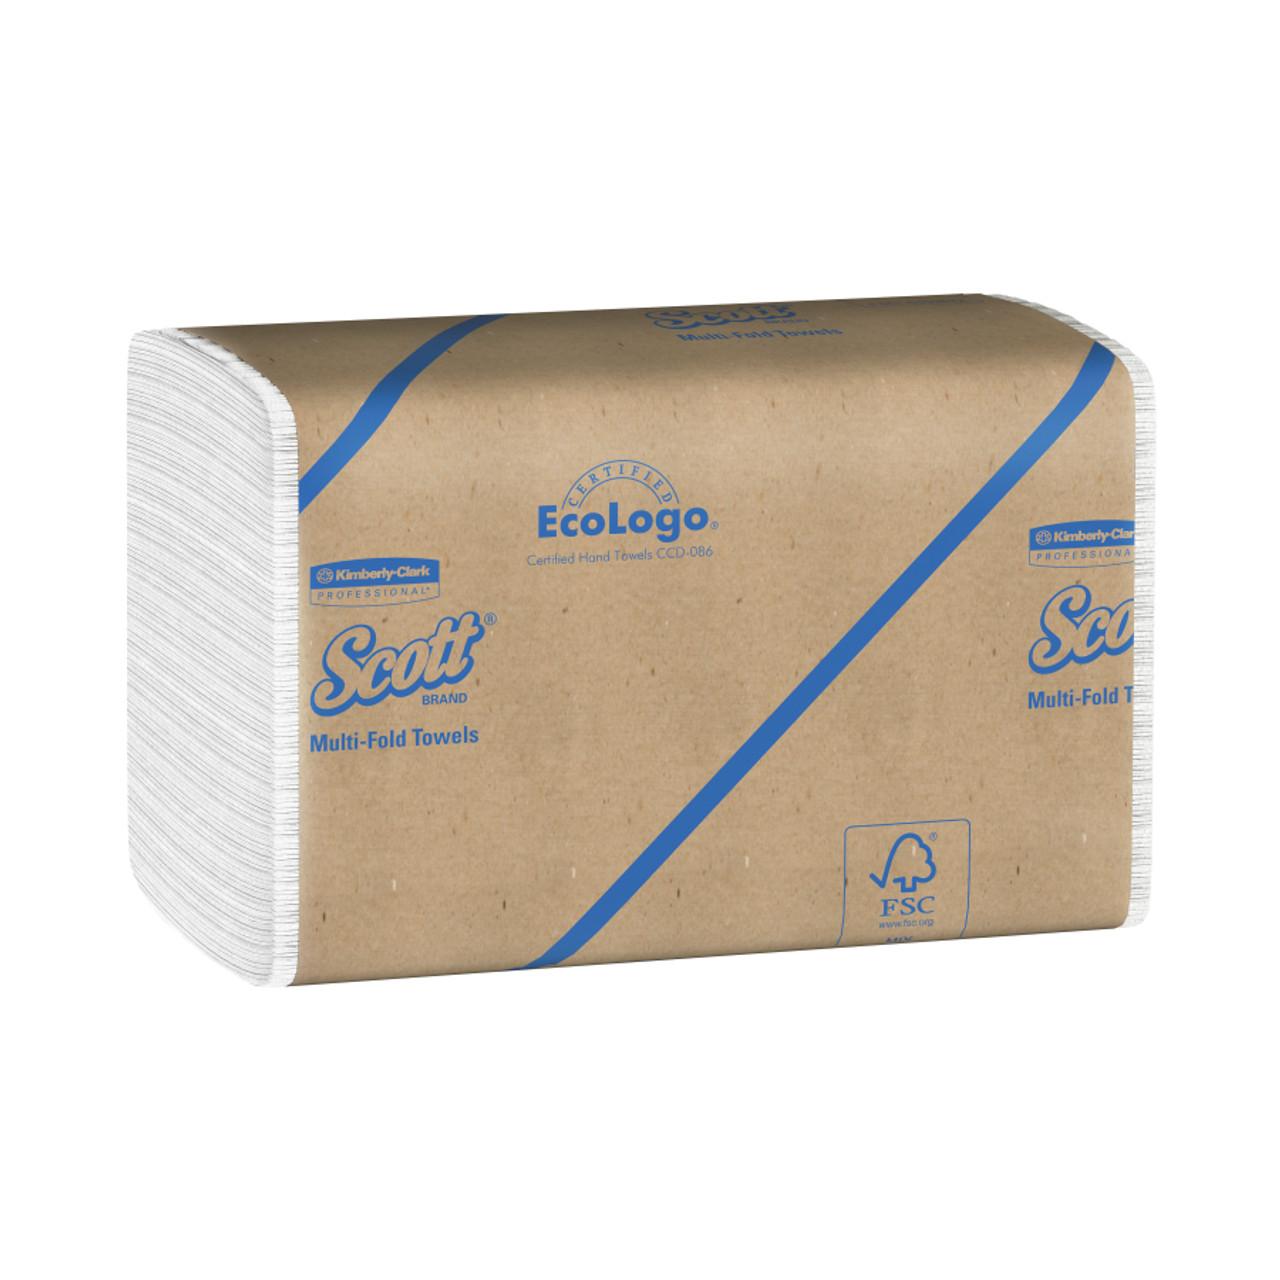 Scott Paper Folded Hand Towel White 175 Count